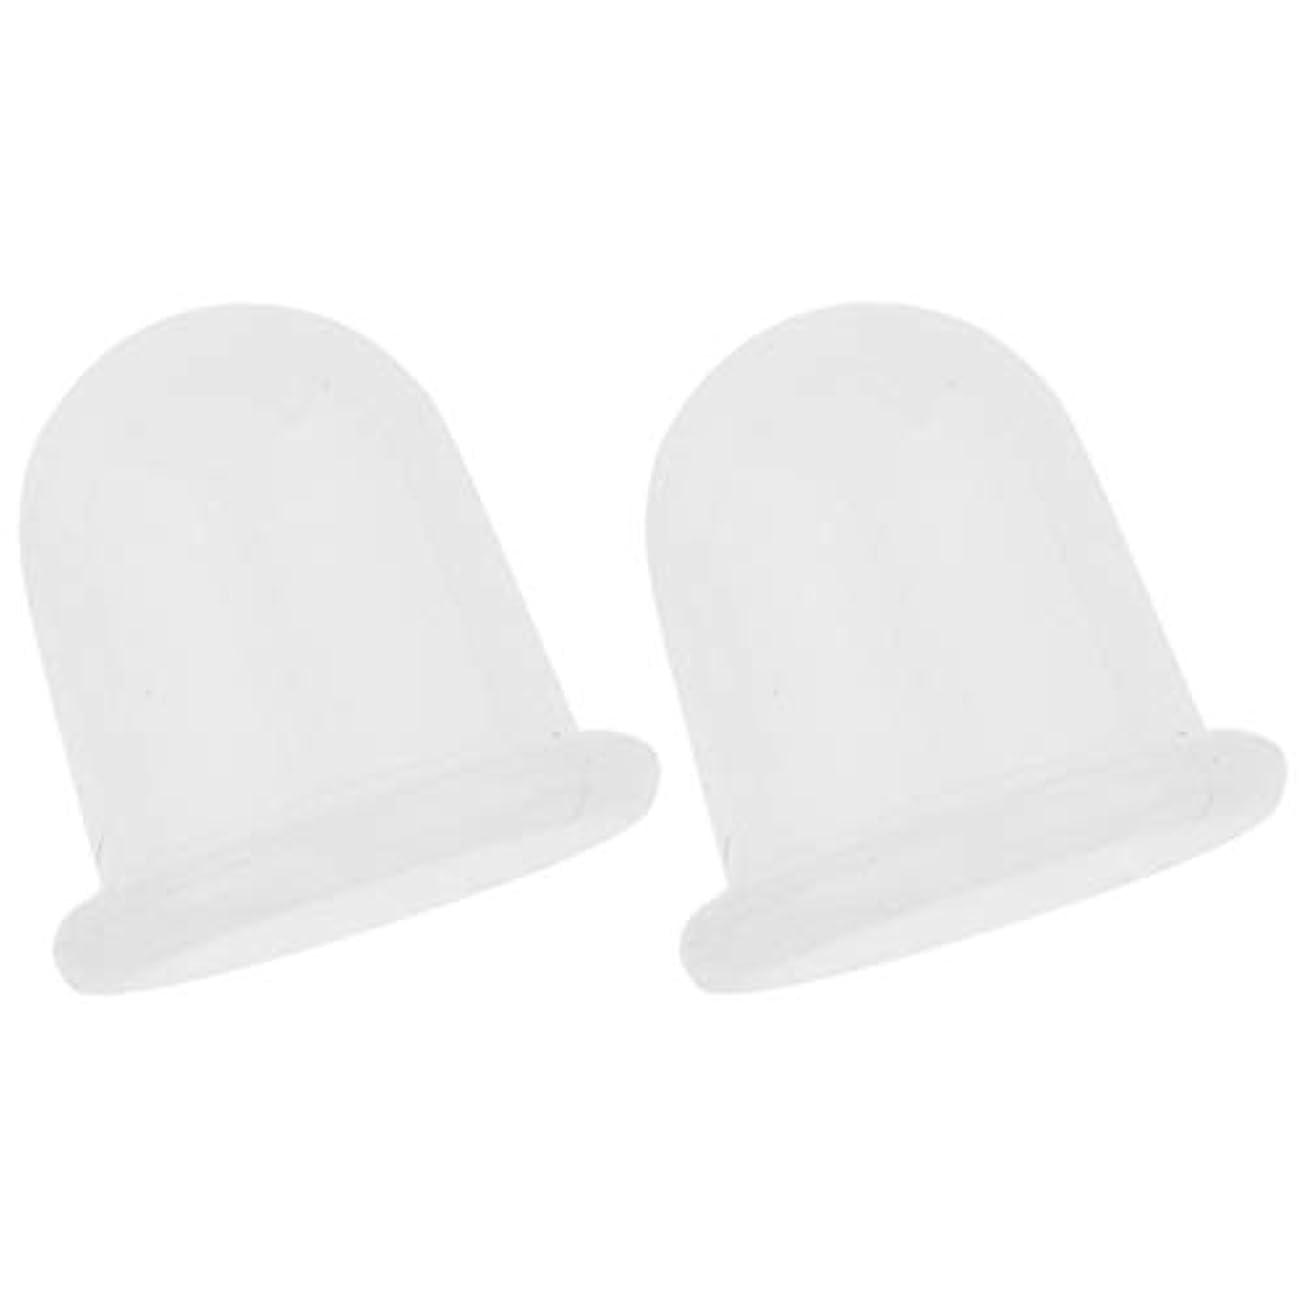 sharprepublic ボディー ビューティーストレス 空カップ 吸い玉 真空カッピングカップ 持ち運び 可能 汎用 2個入り